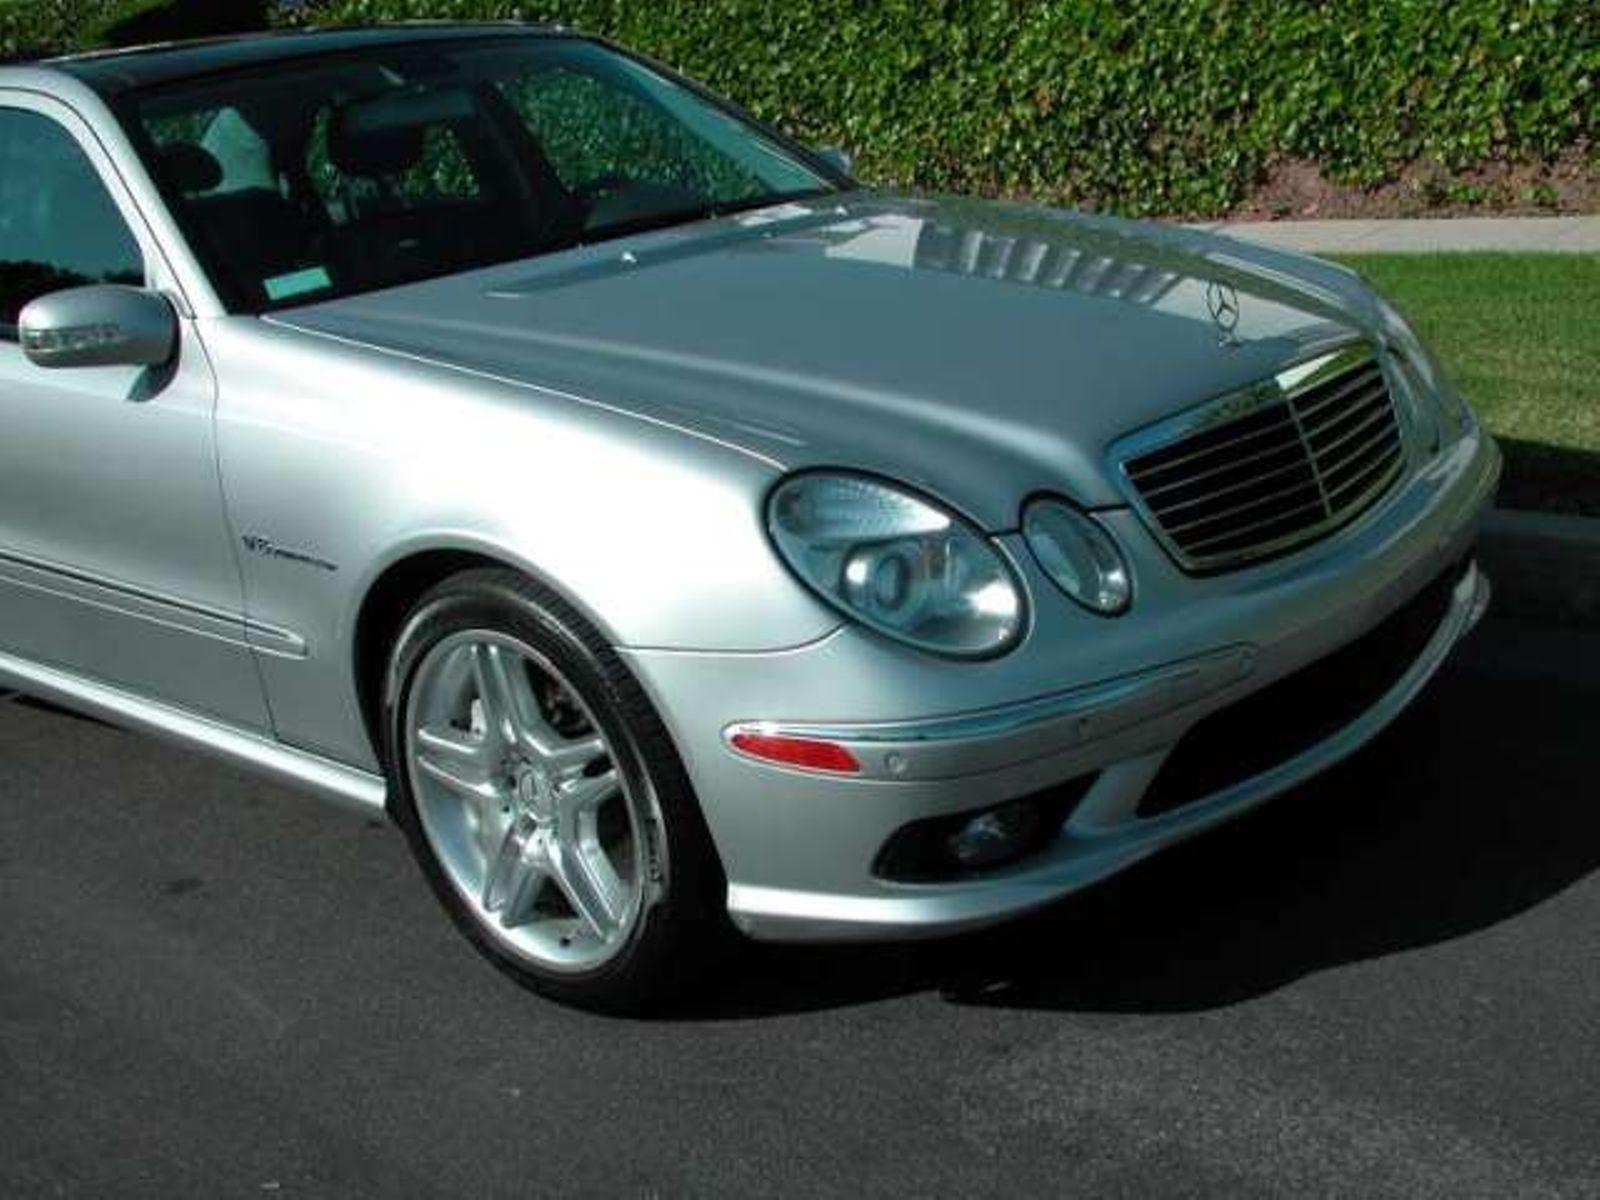 2004 Mercedes Benz E 55 AMG city California Auto Fitness Class Benz